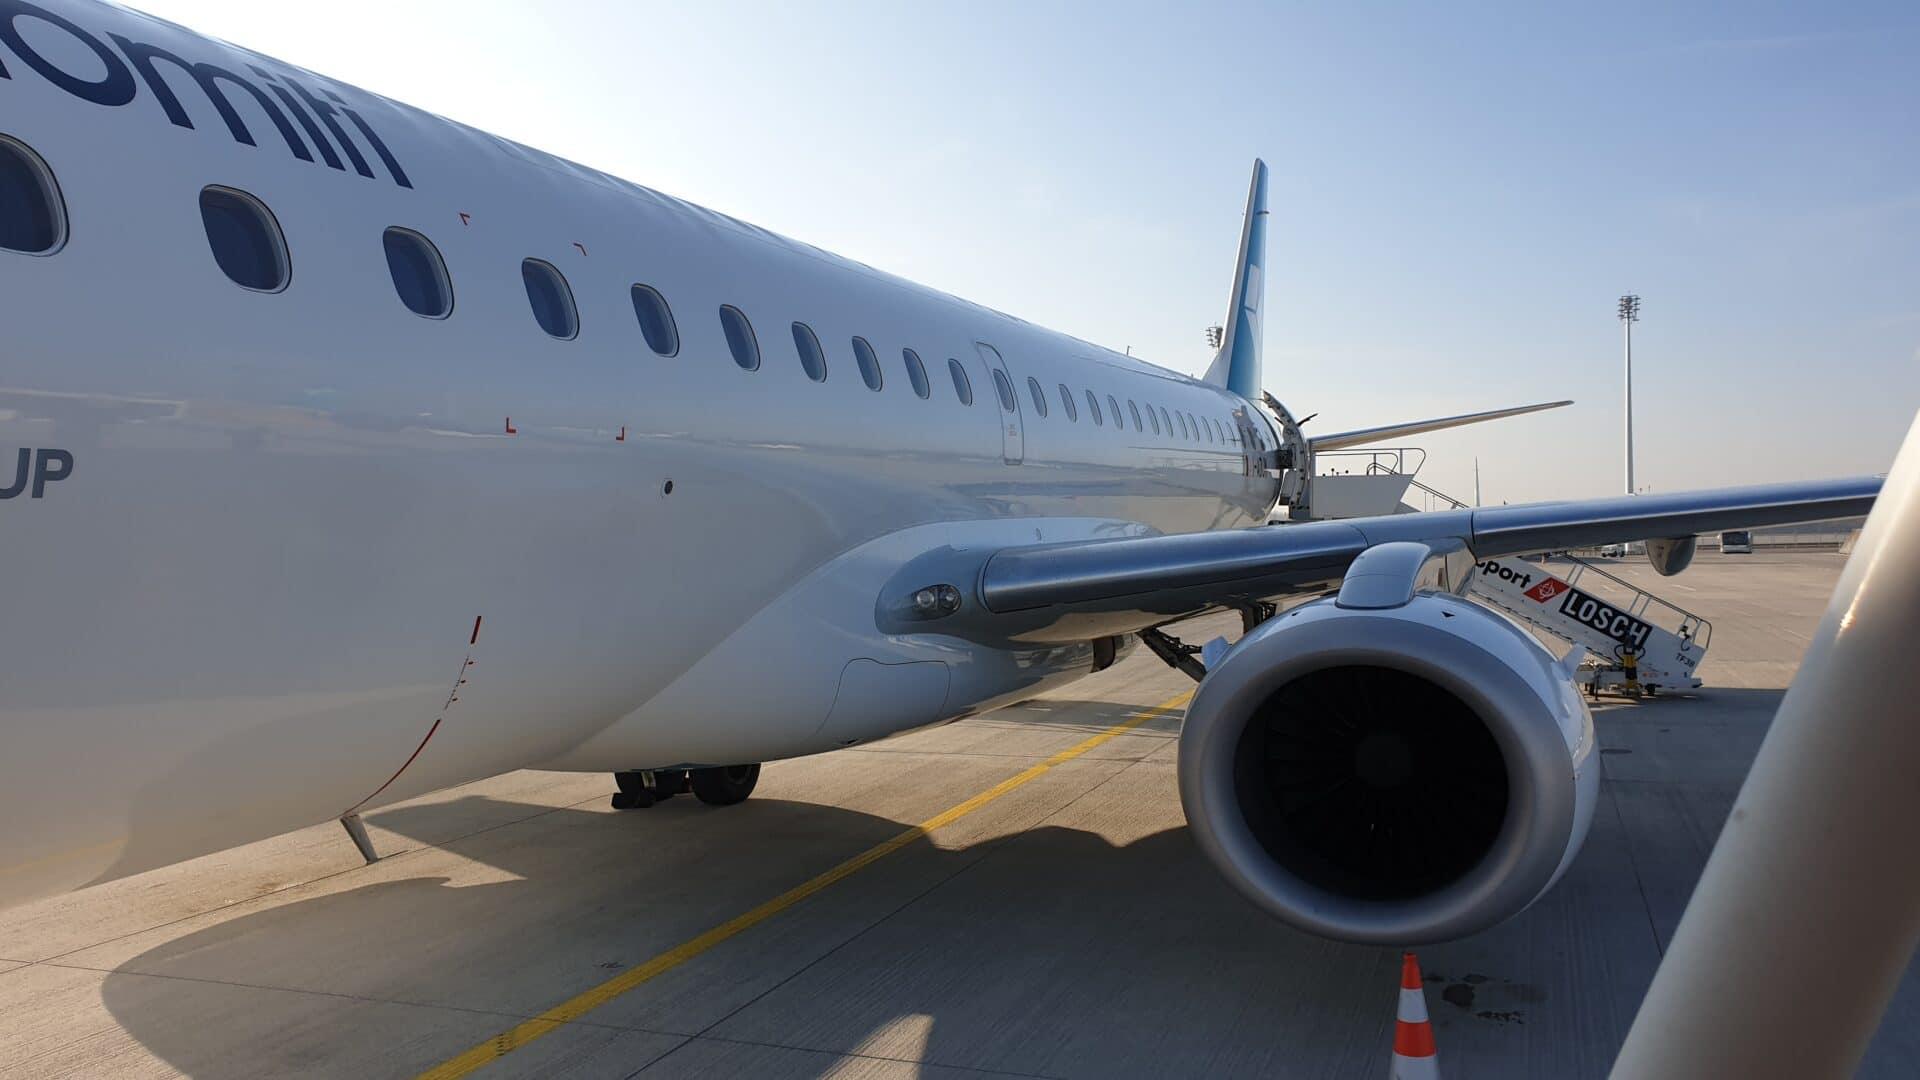 MUC MXP Air Dolomiti Neues Design E190